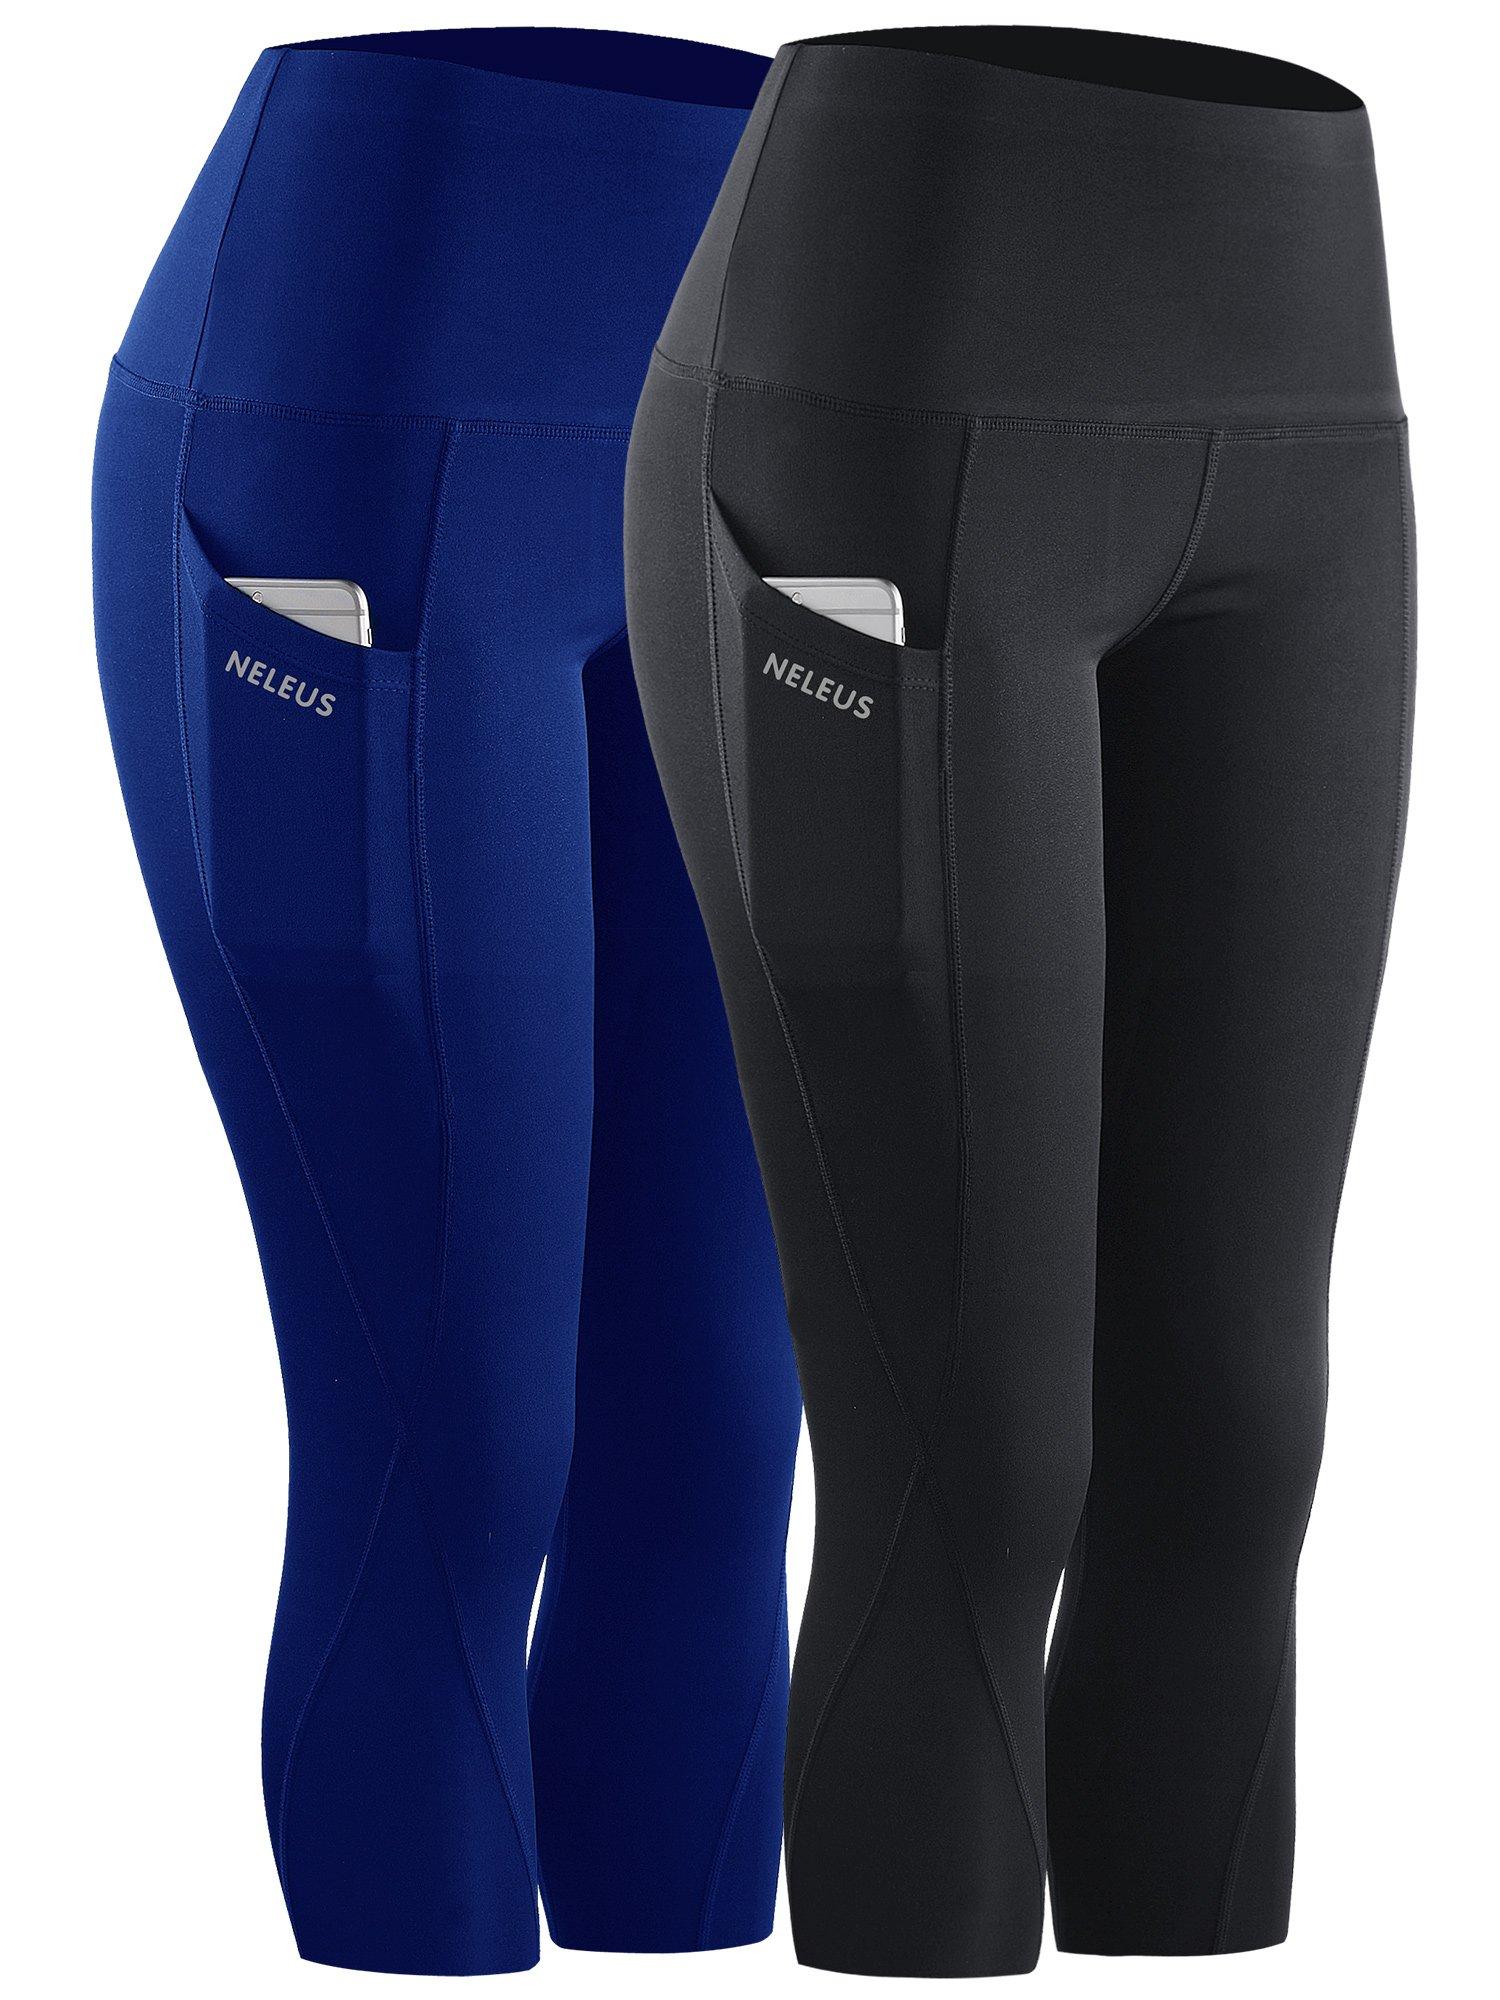 Neleus 2 Pack Tummy Control High Waist Workout Yoga Capri Leggings,9027,Black,Blue,S,EU M